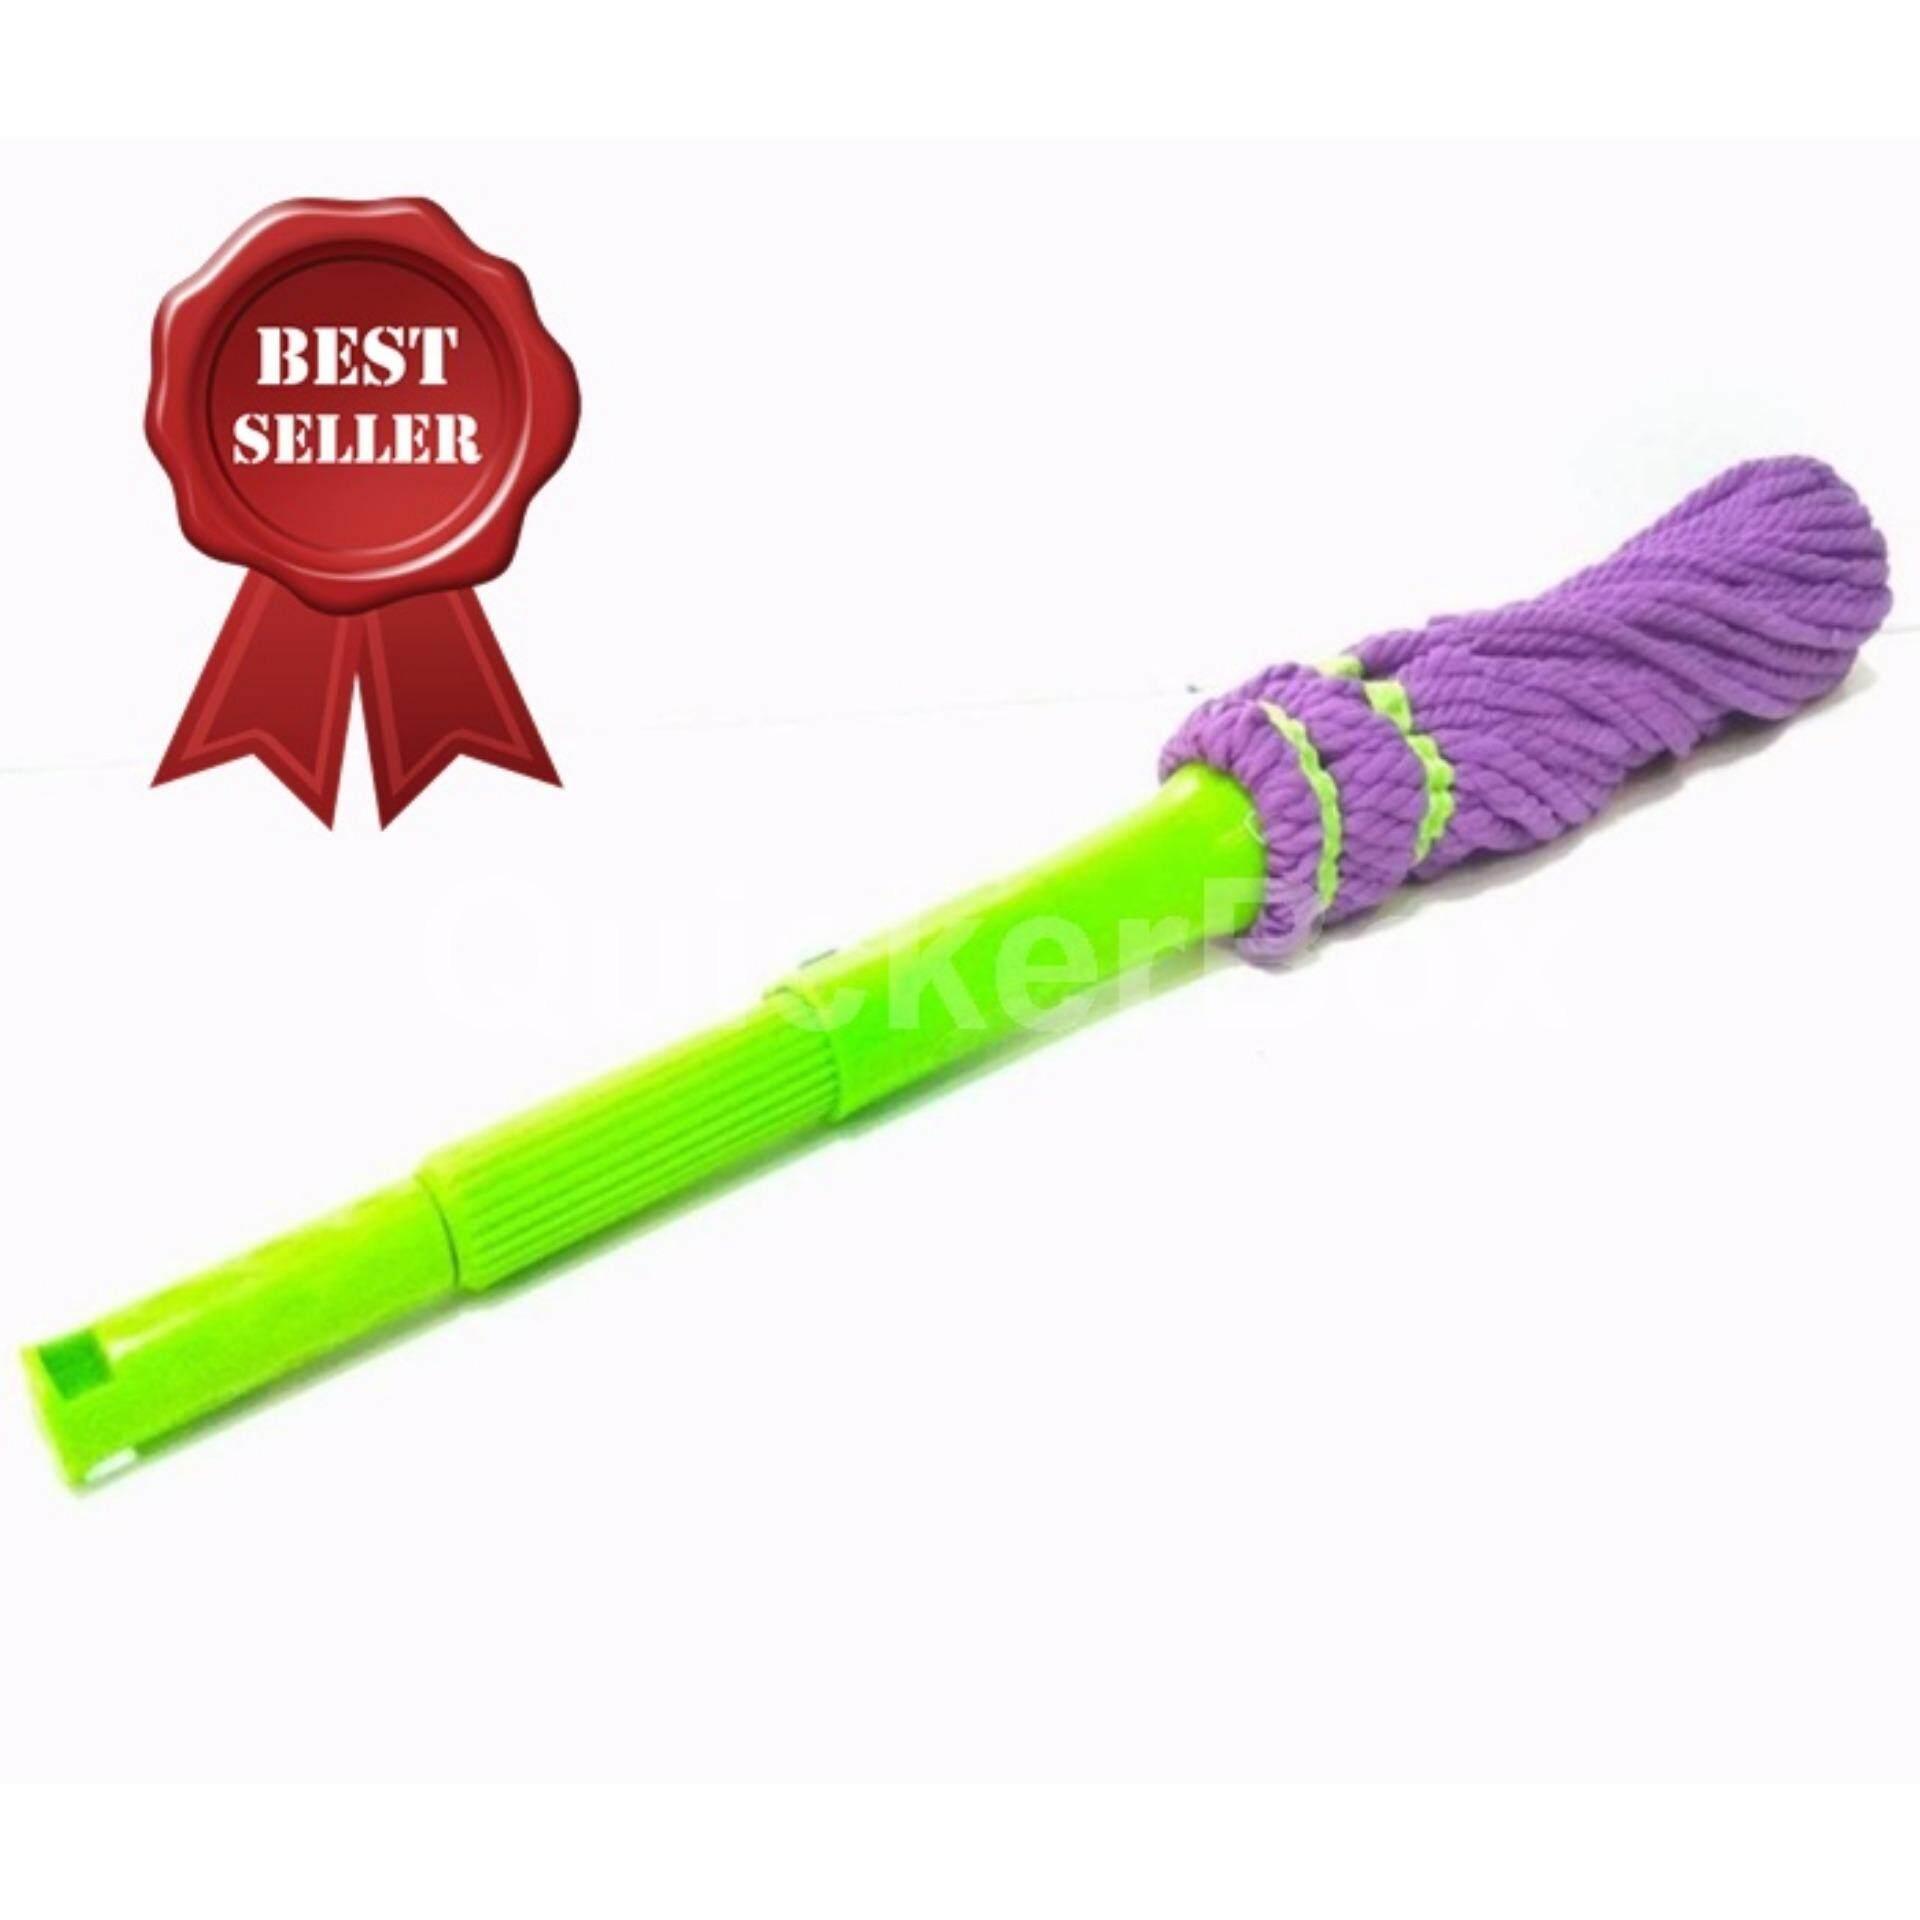 TWIST MAGIC MOP Purple ไม้ถูพื้น แบบบิด ผ้าหนาไมใครไฟเบอร์ ฟรีค่าจัดส่ง Kerry Express ส่งด่วน